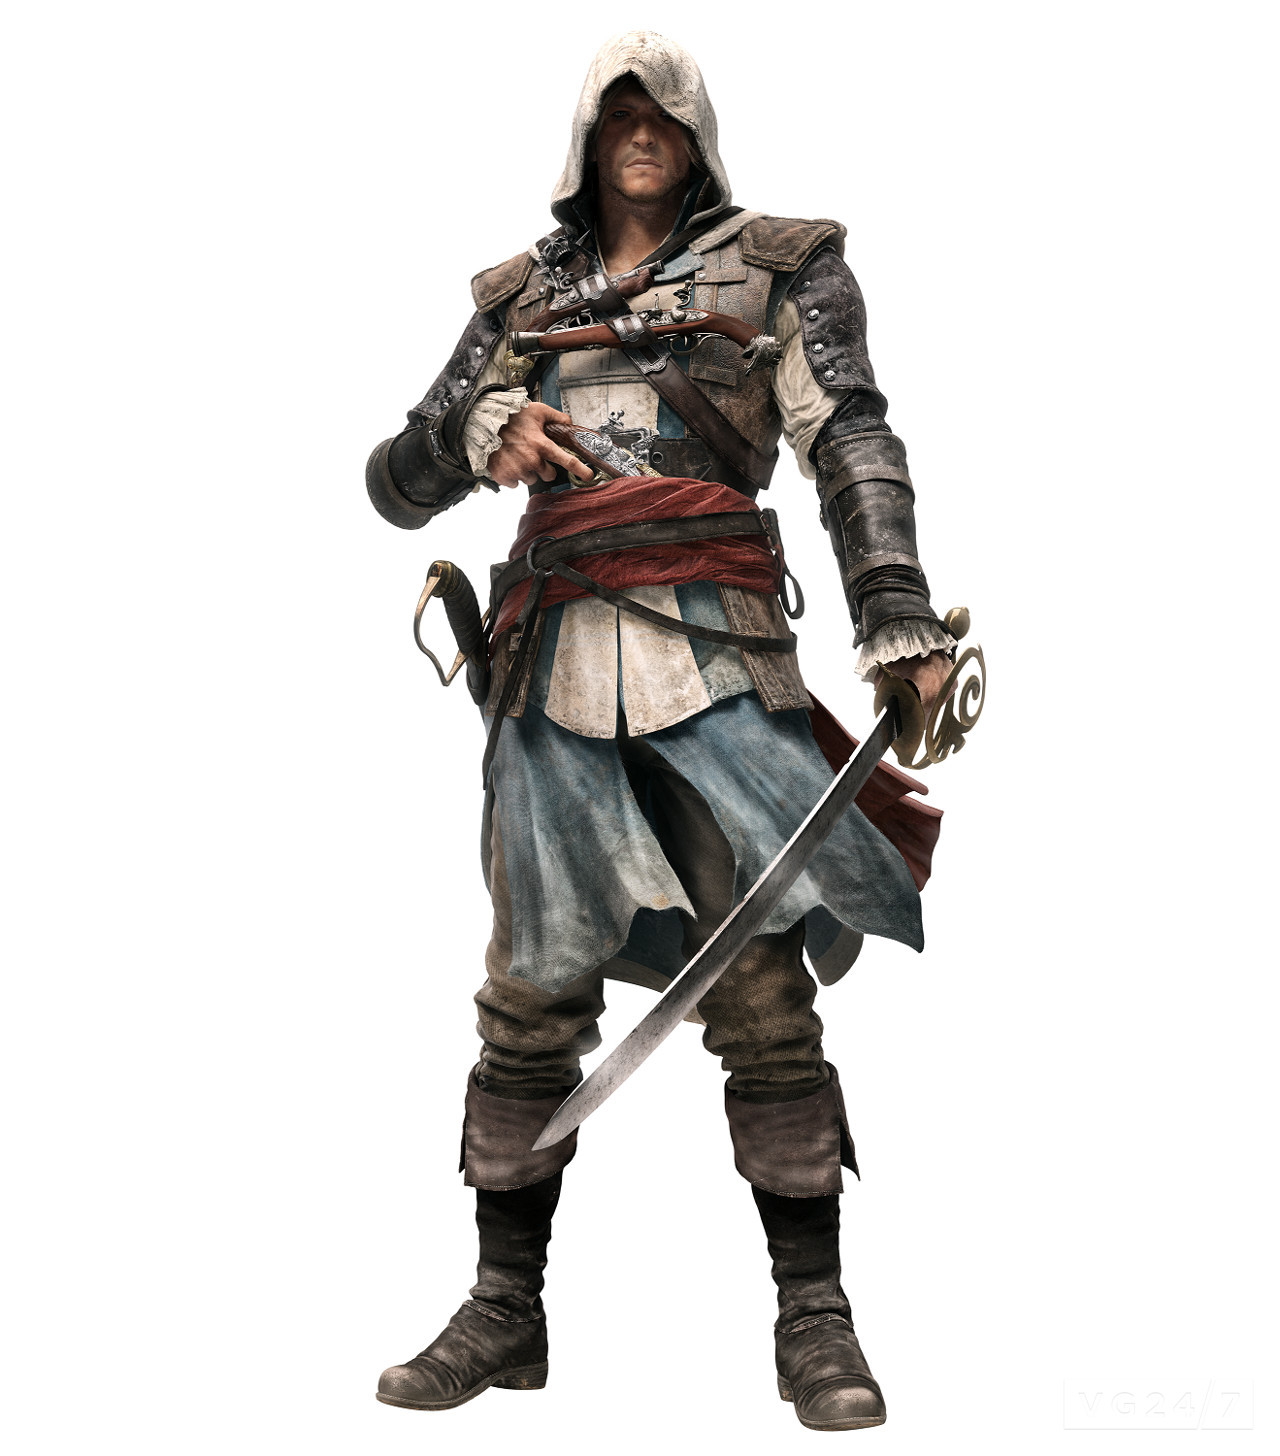 Assassin's Creed 4: Black Flag – set sail for murder | VG247